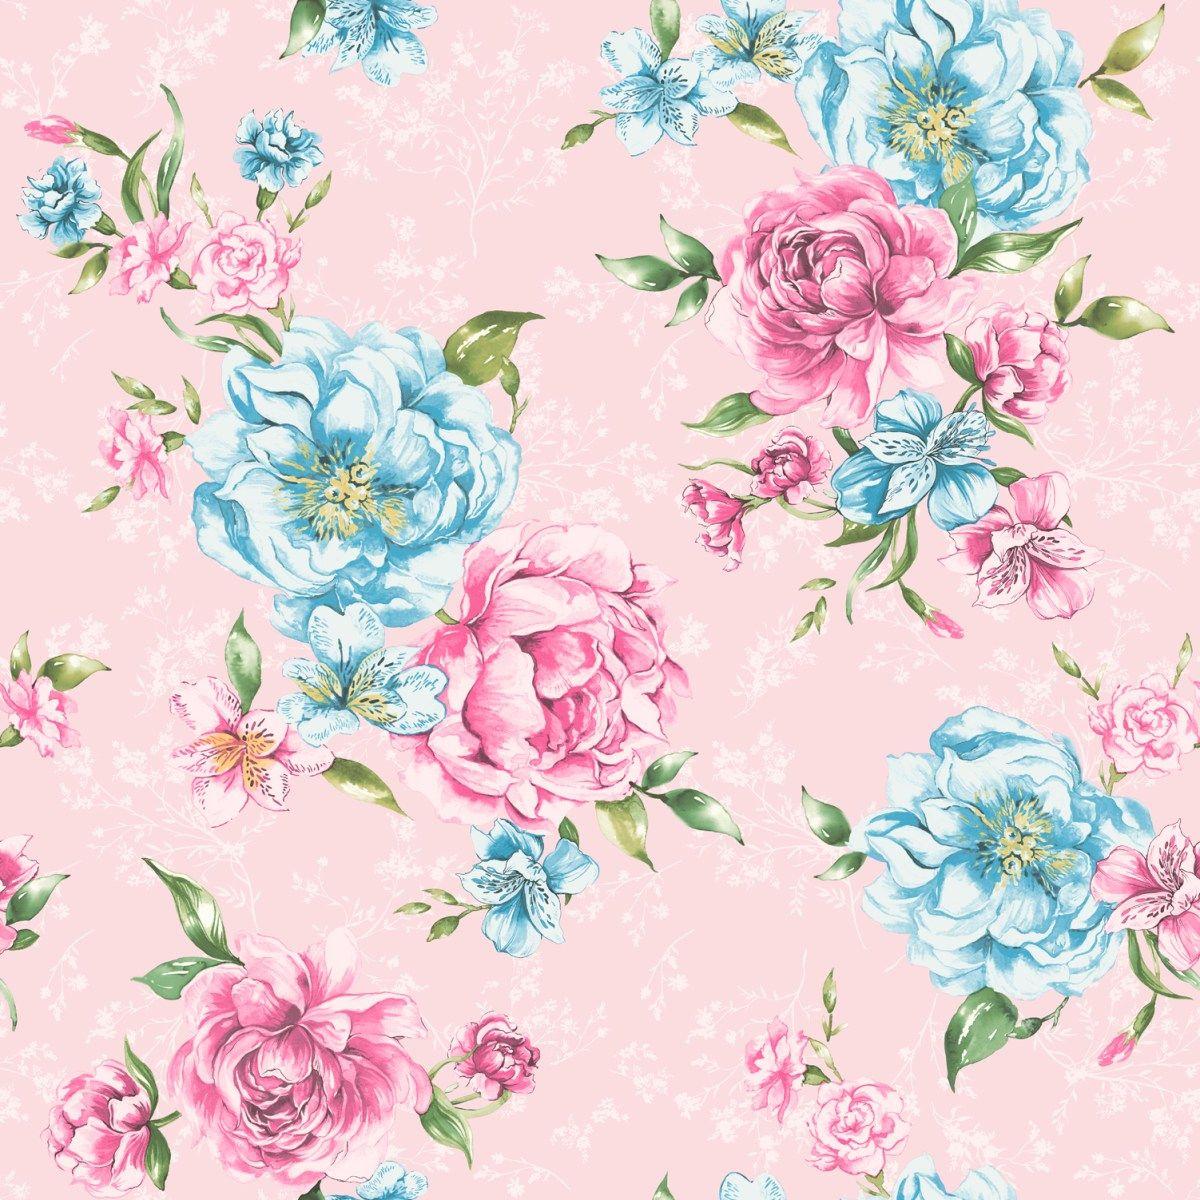 Josephine Floral Wallpaper Pink Blue 98864 Wallpaper Pink And Blue Floral Wallpaper Blue Floral Wallpaper